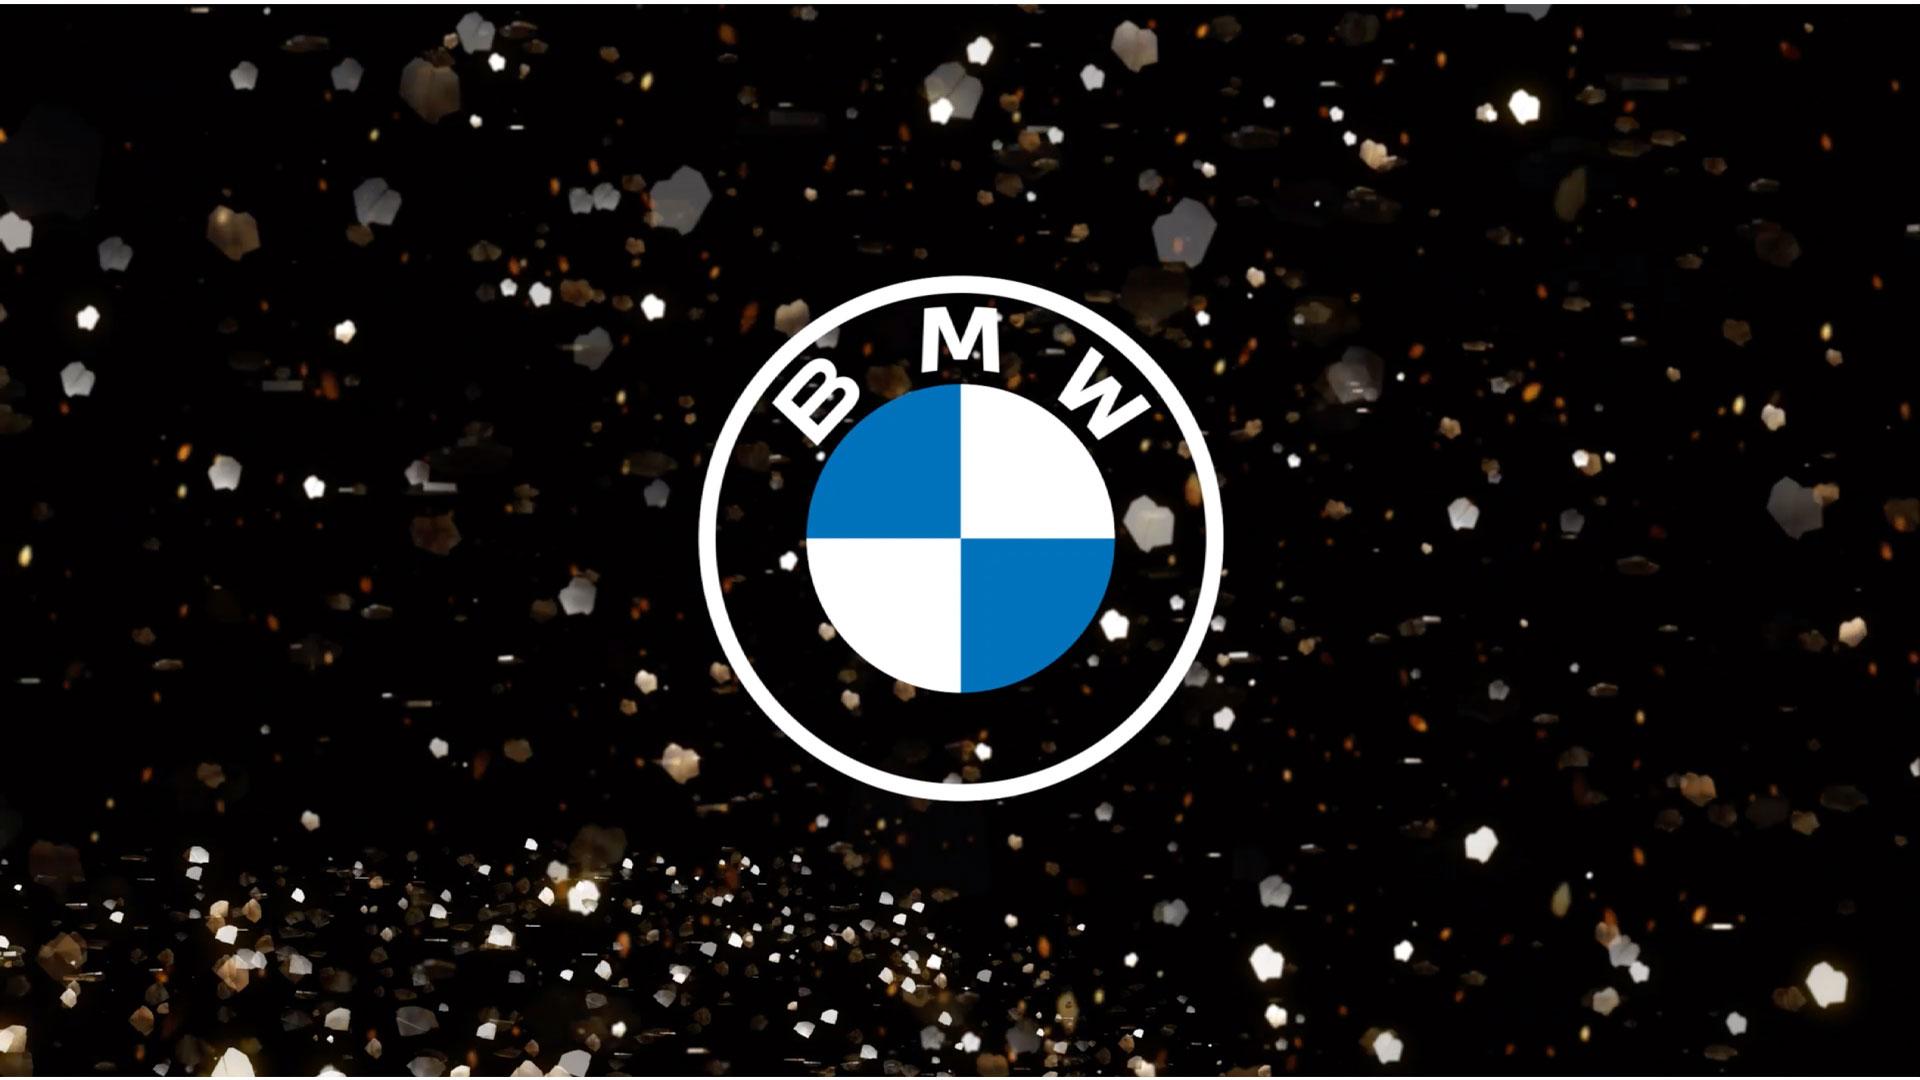 Bmw Speaks Out On Misinterpretation Of New Logo